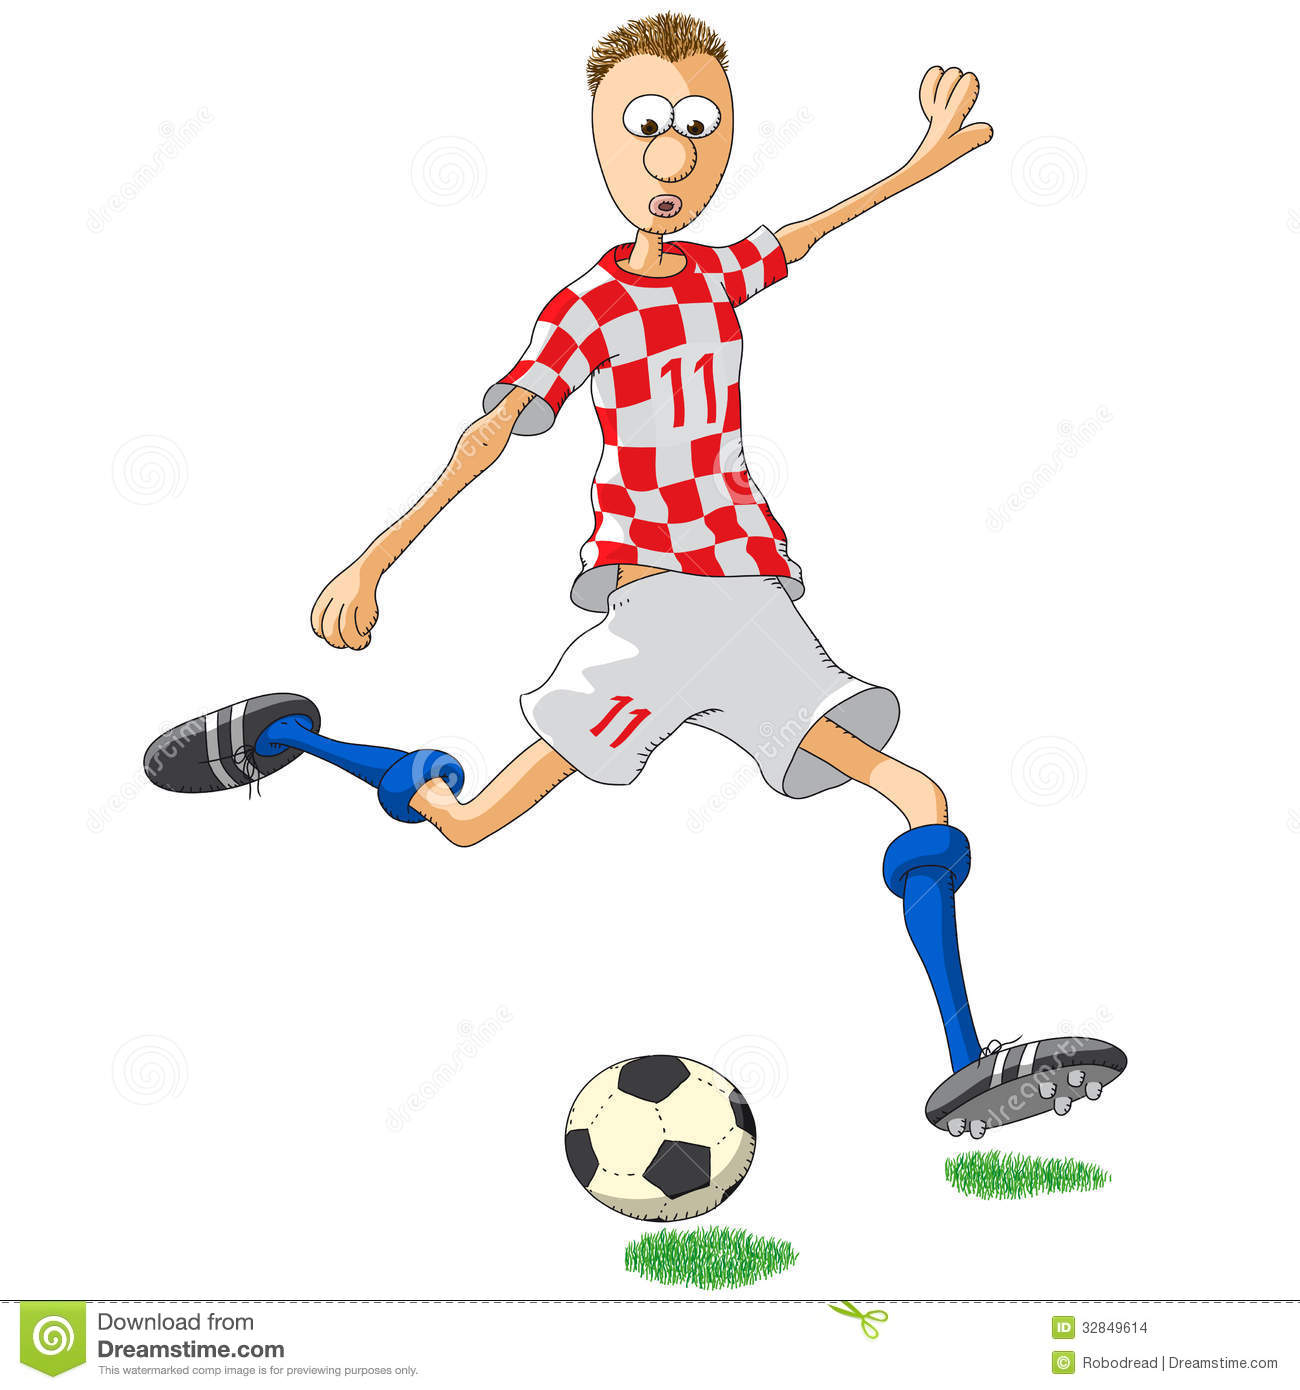 Croatian clipart.